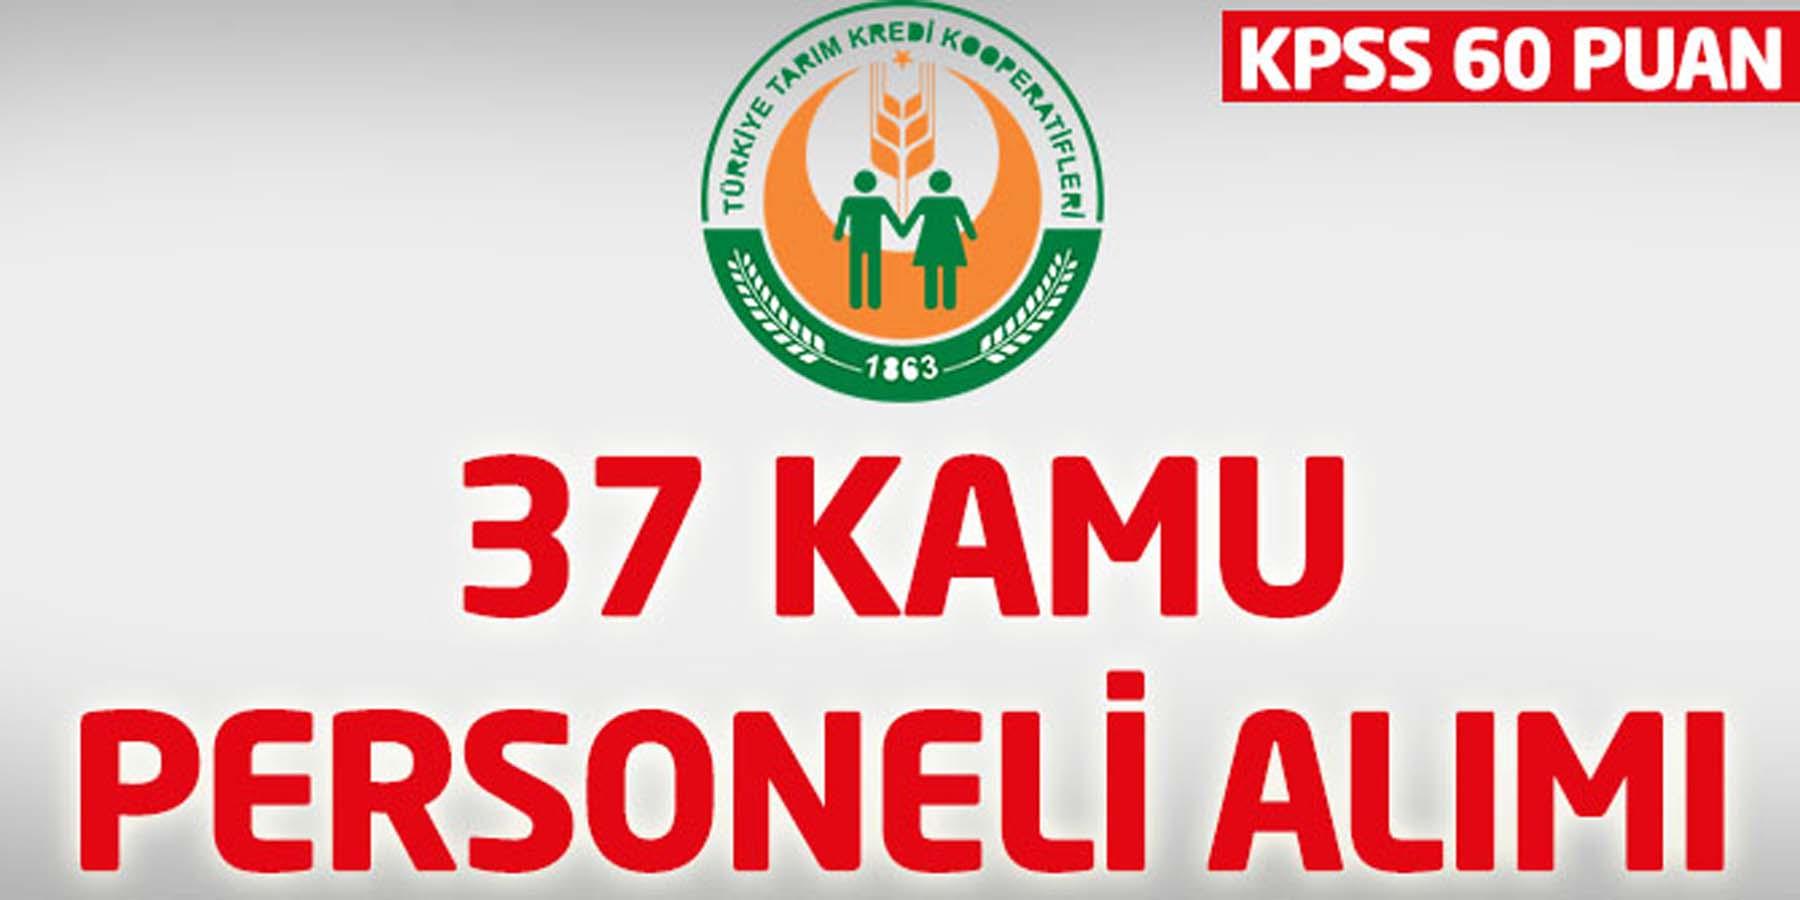 Tarım Kredi Kooperatifleri KPSS 60 Puan 37 Kamu Personeli Alımı